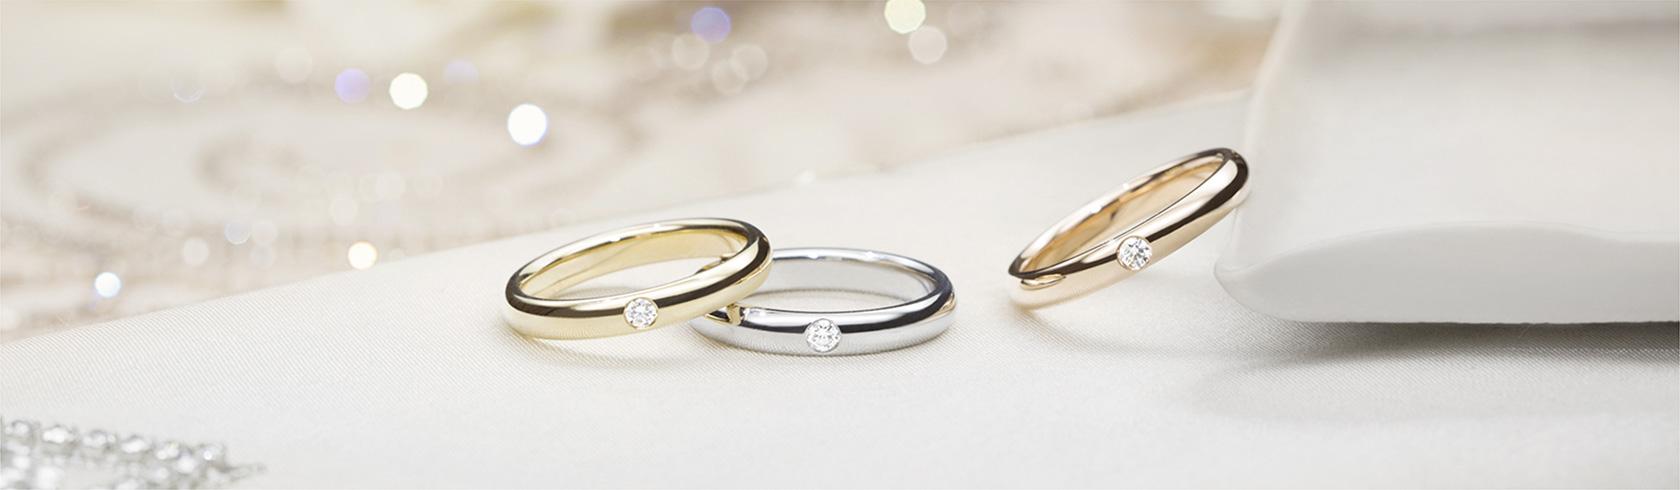 Diamond Wedding Bands | Fine Jewelry | Harry Winston With Regard To Newest Wave Diamond Wedding Bands With Pavé (View 25 of 25)